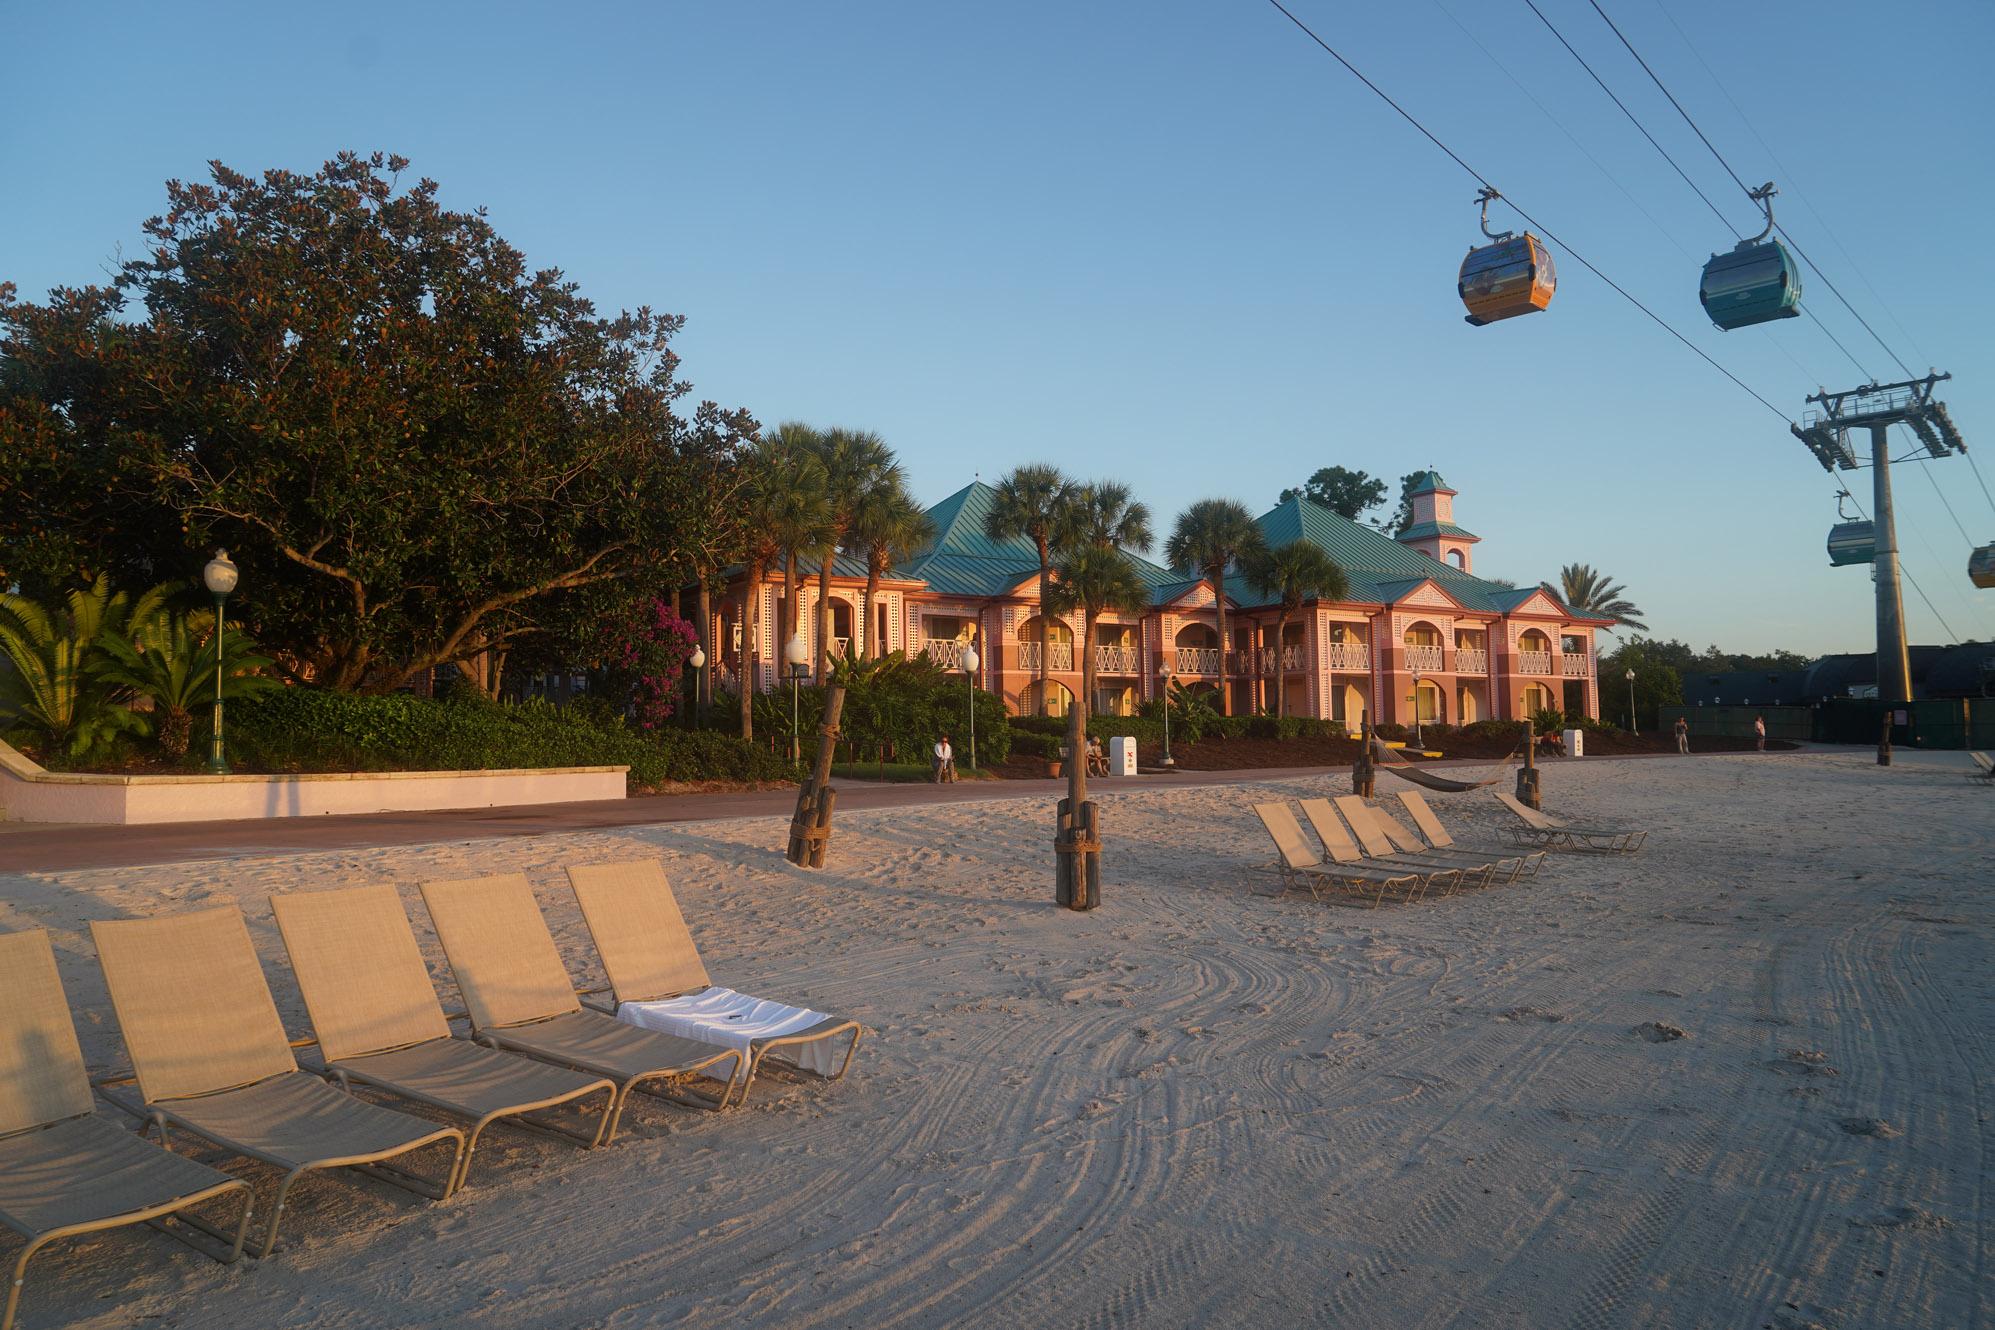 compare disney resorts